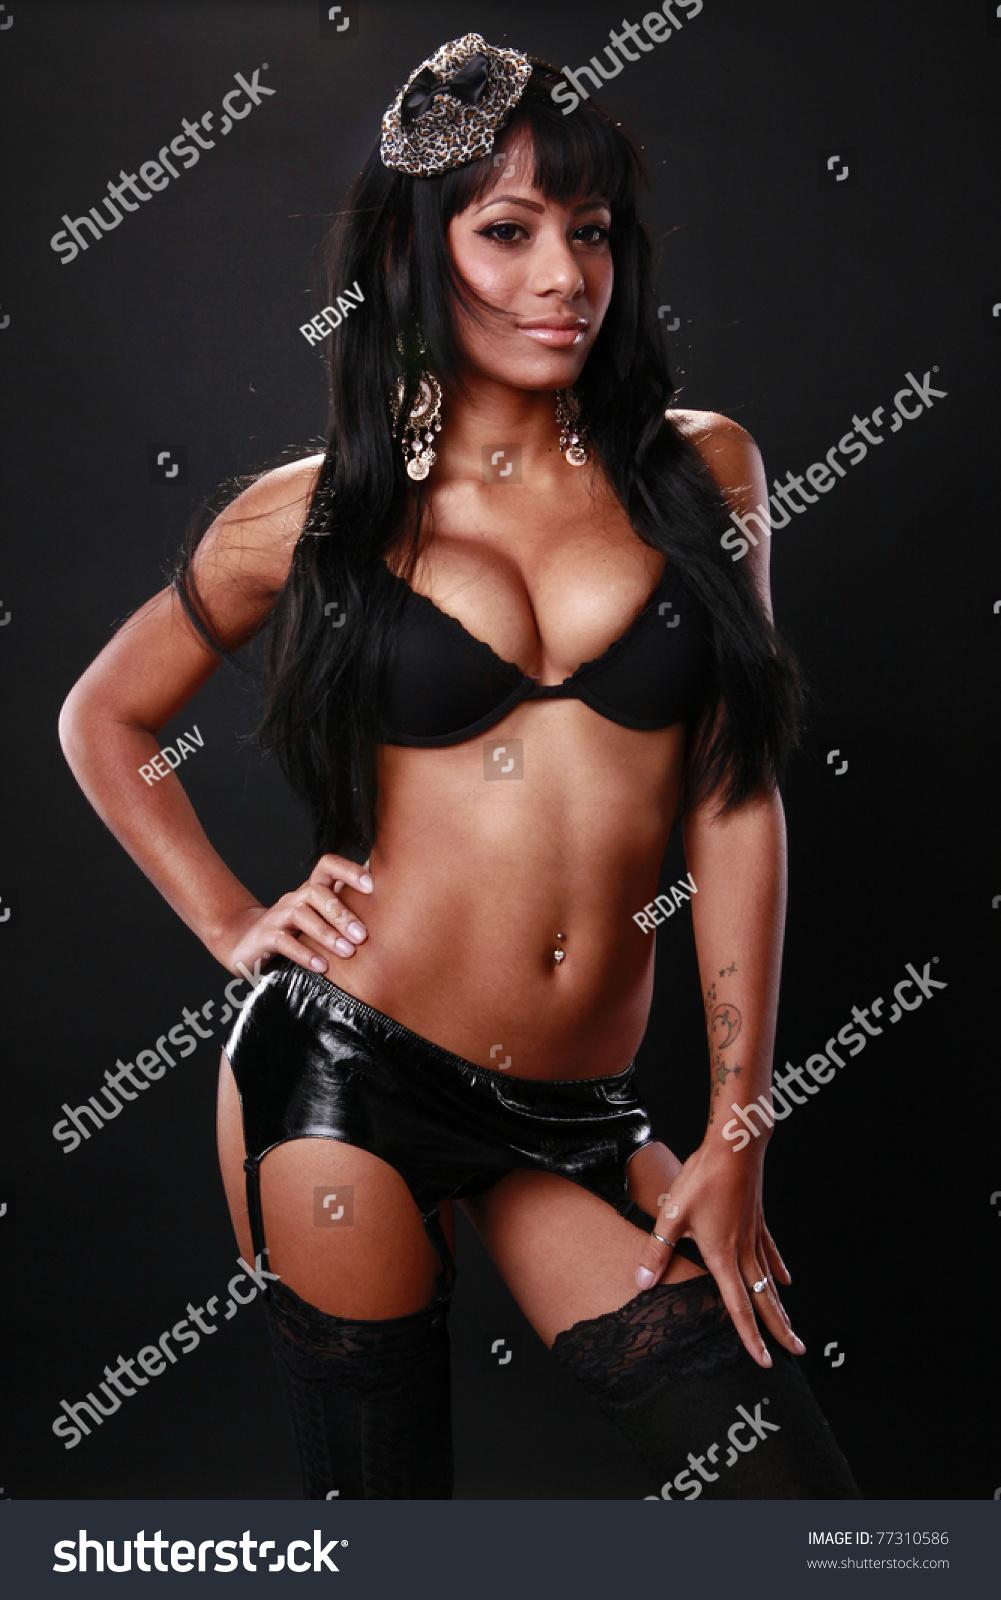 Pictures of erotic caribbean women